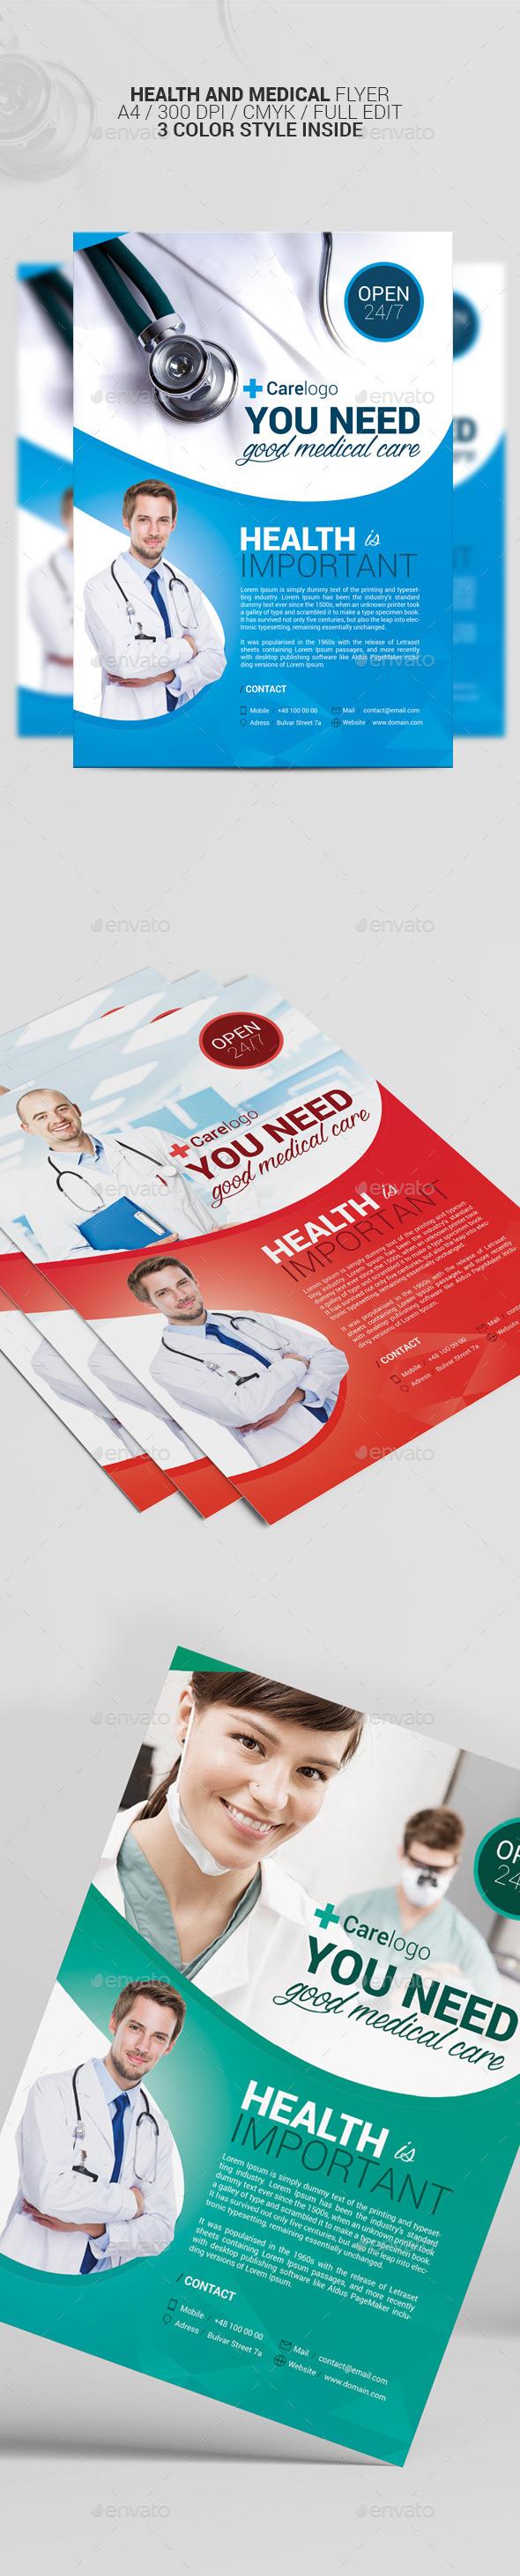 Health Flyer - Corporate Flyers